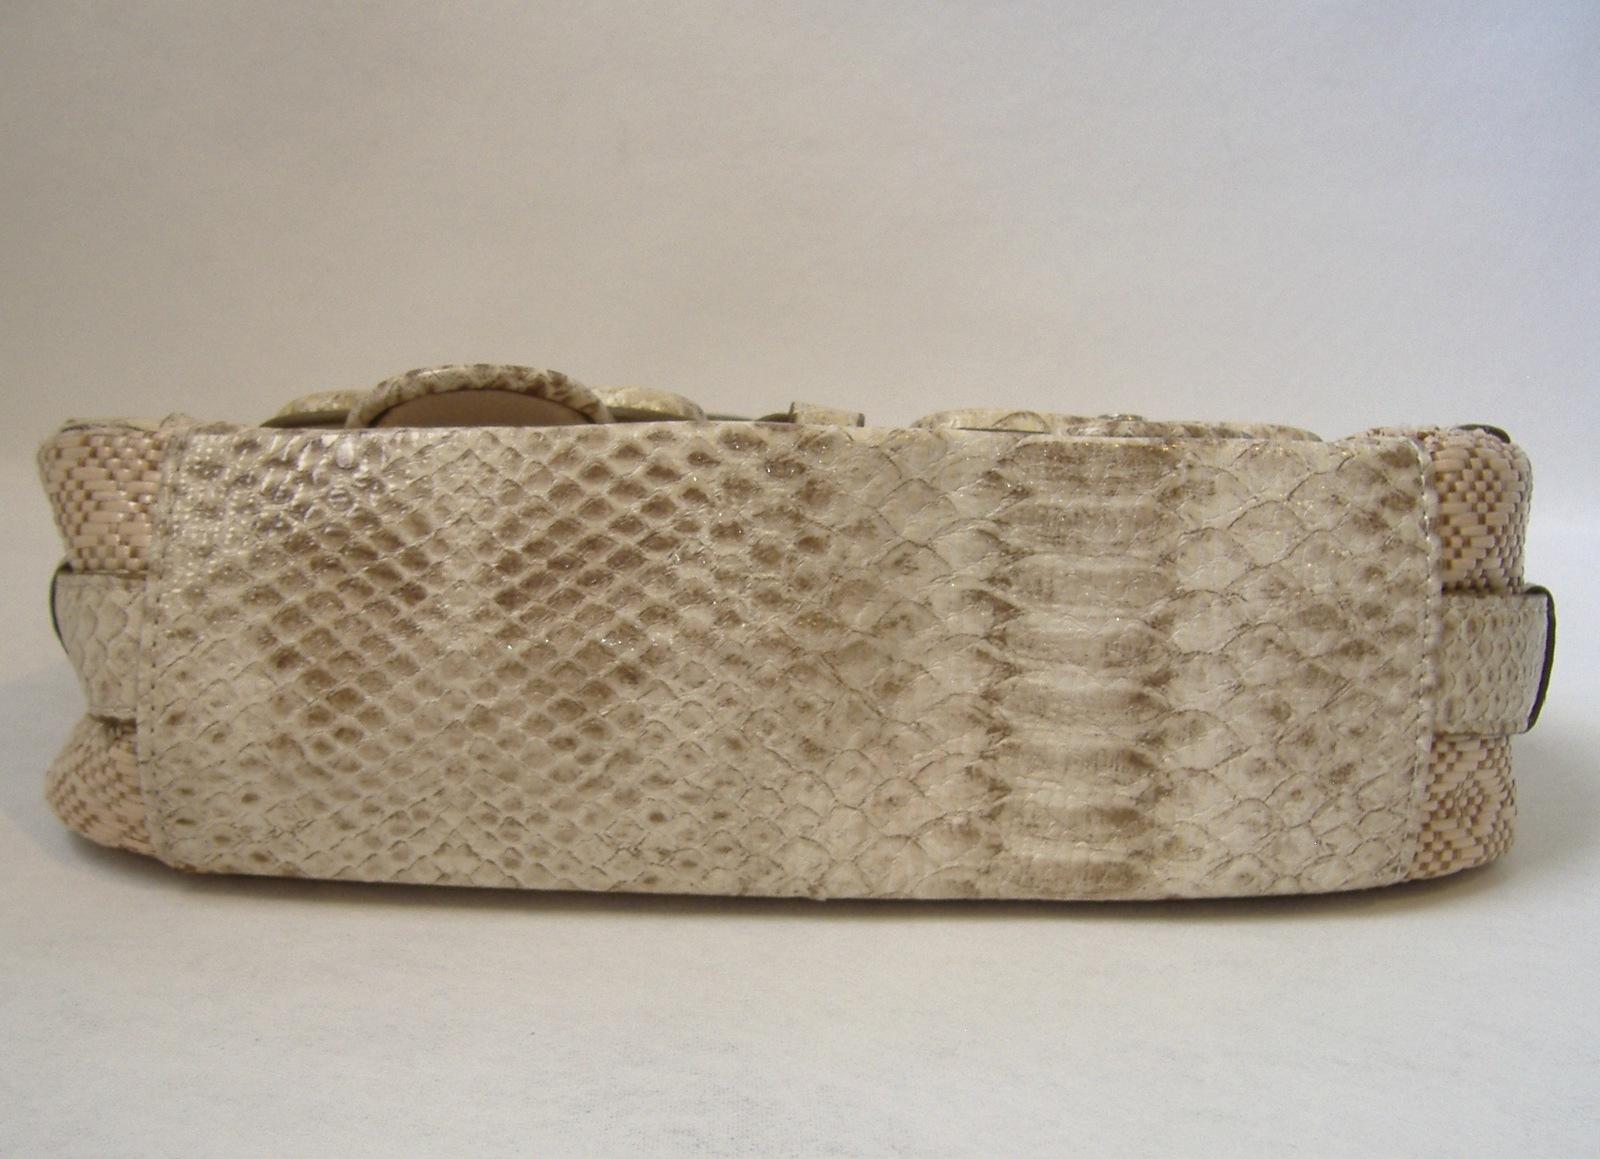 XOXO Faux Snakeskin Weave Purse Baguette Beige Tan Handbag Tote Buckles Chain